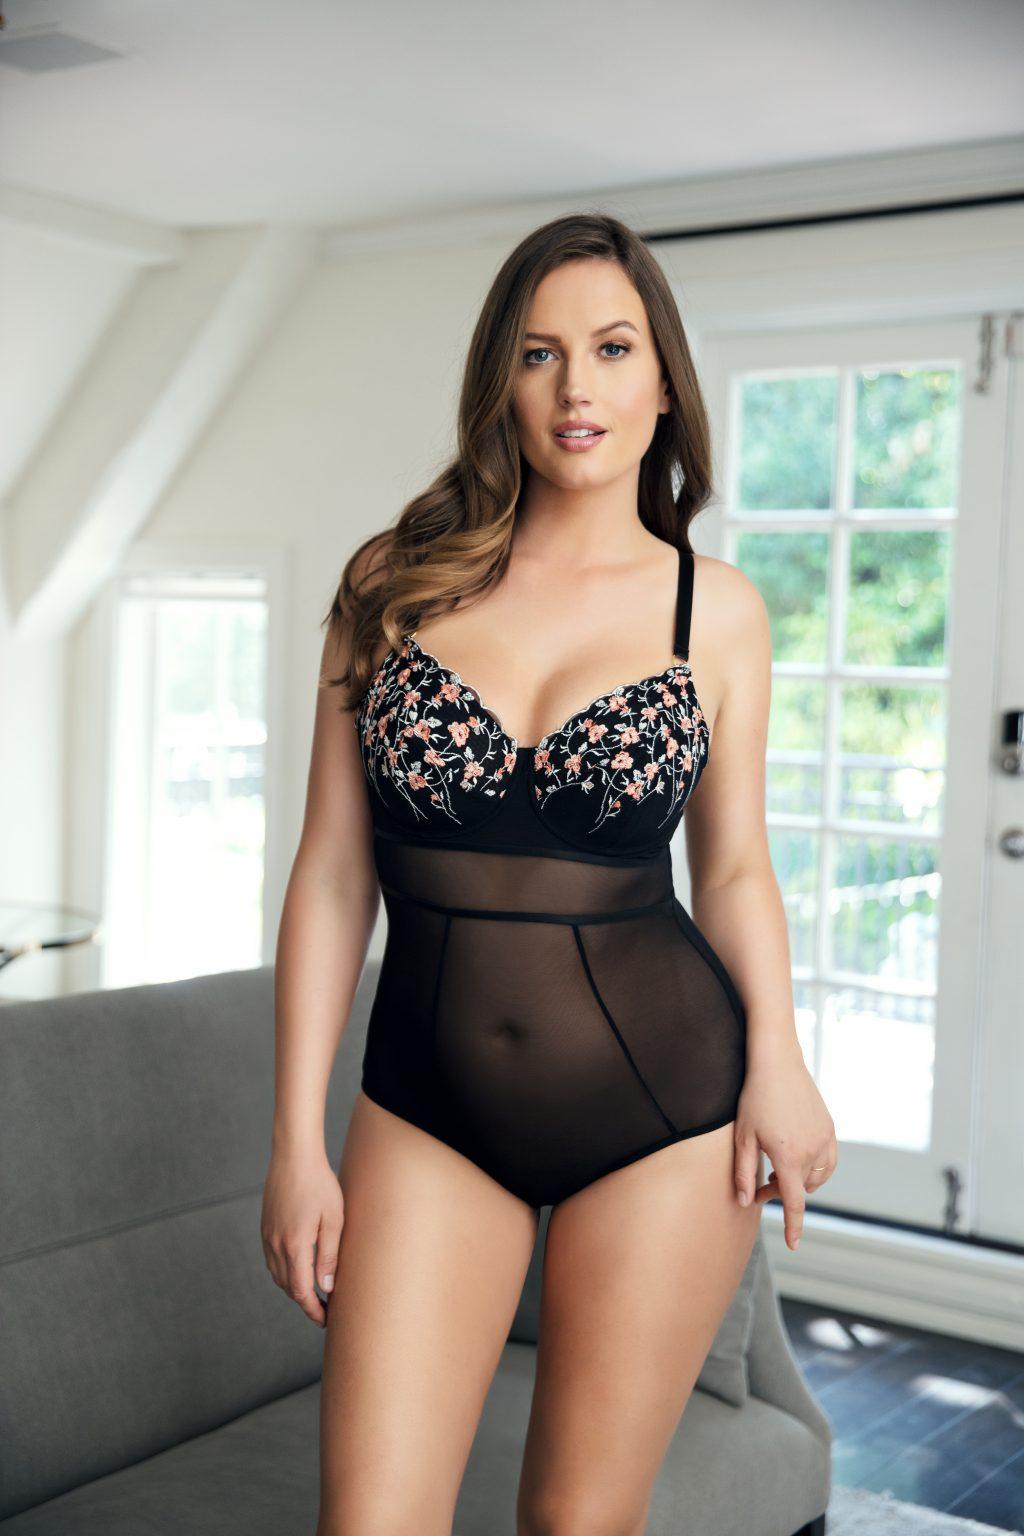 embroidered lingerie bodysuit